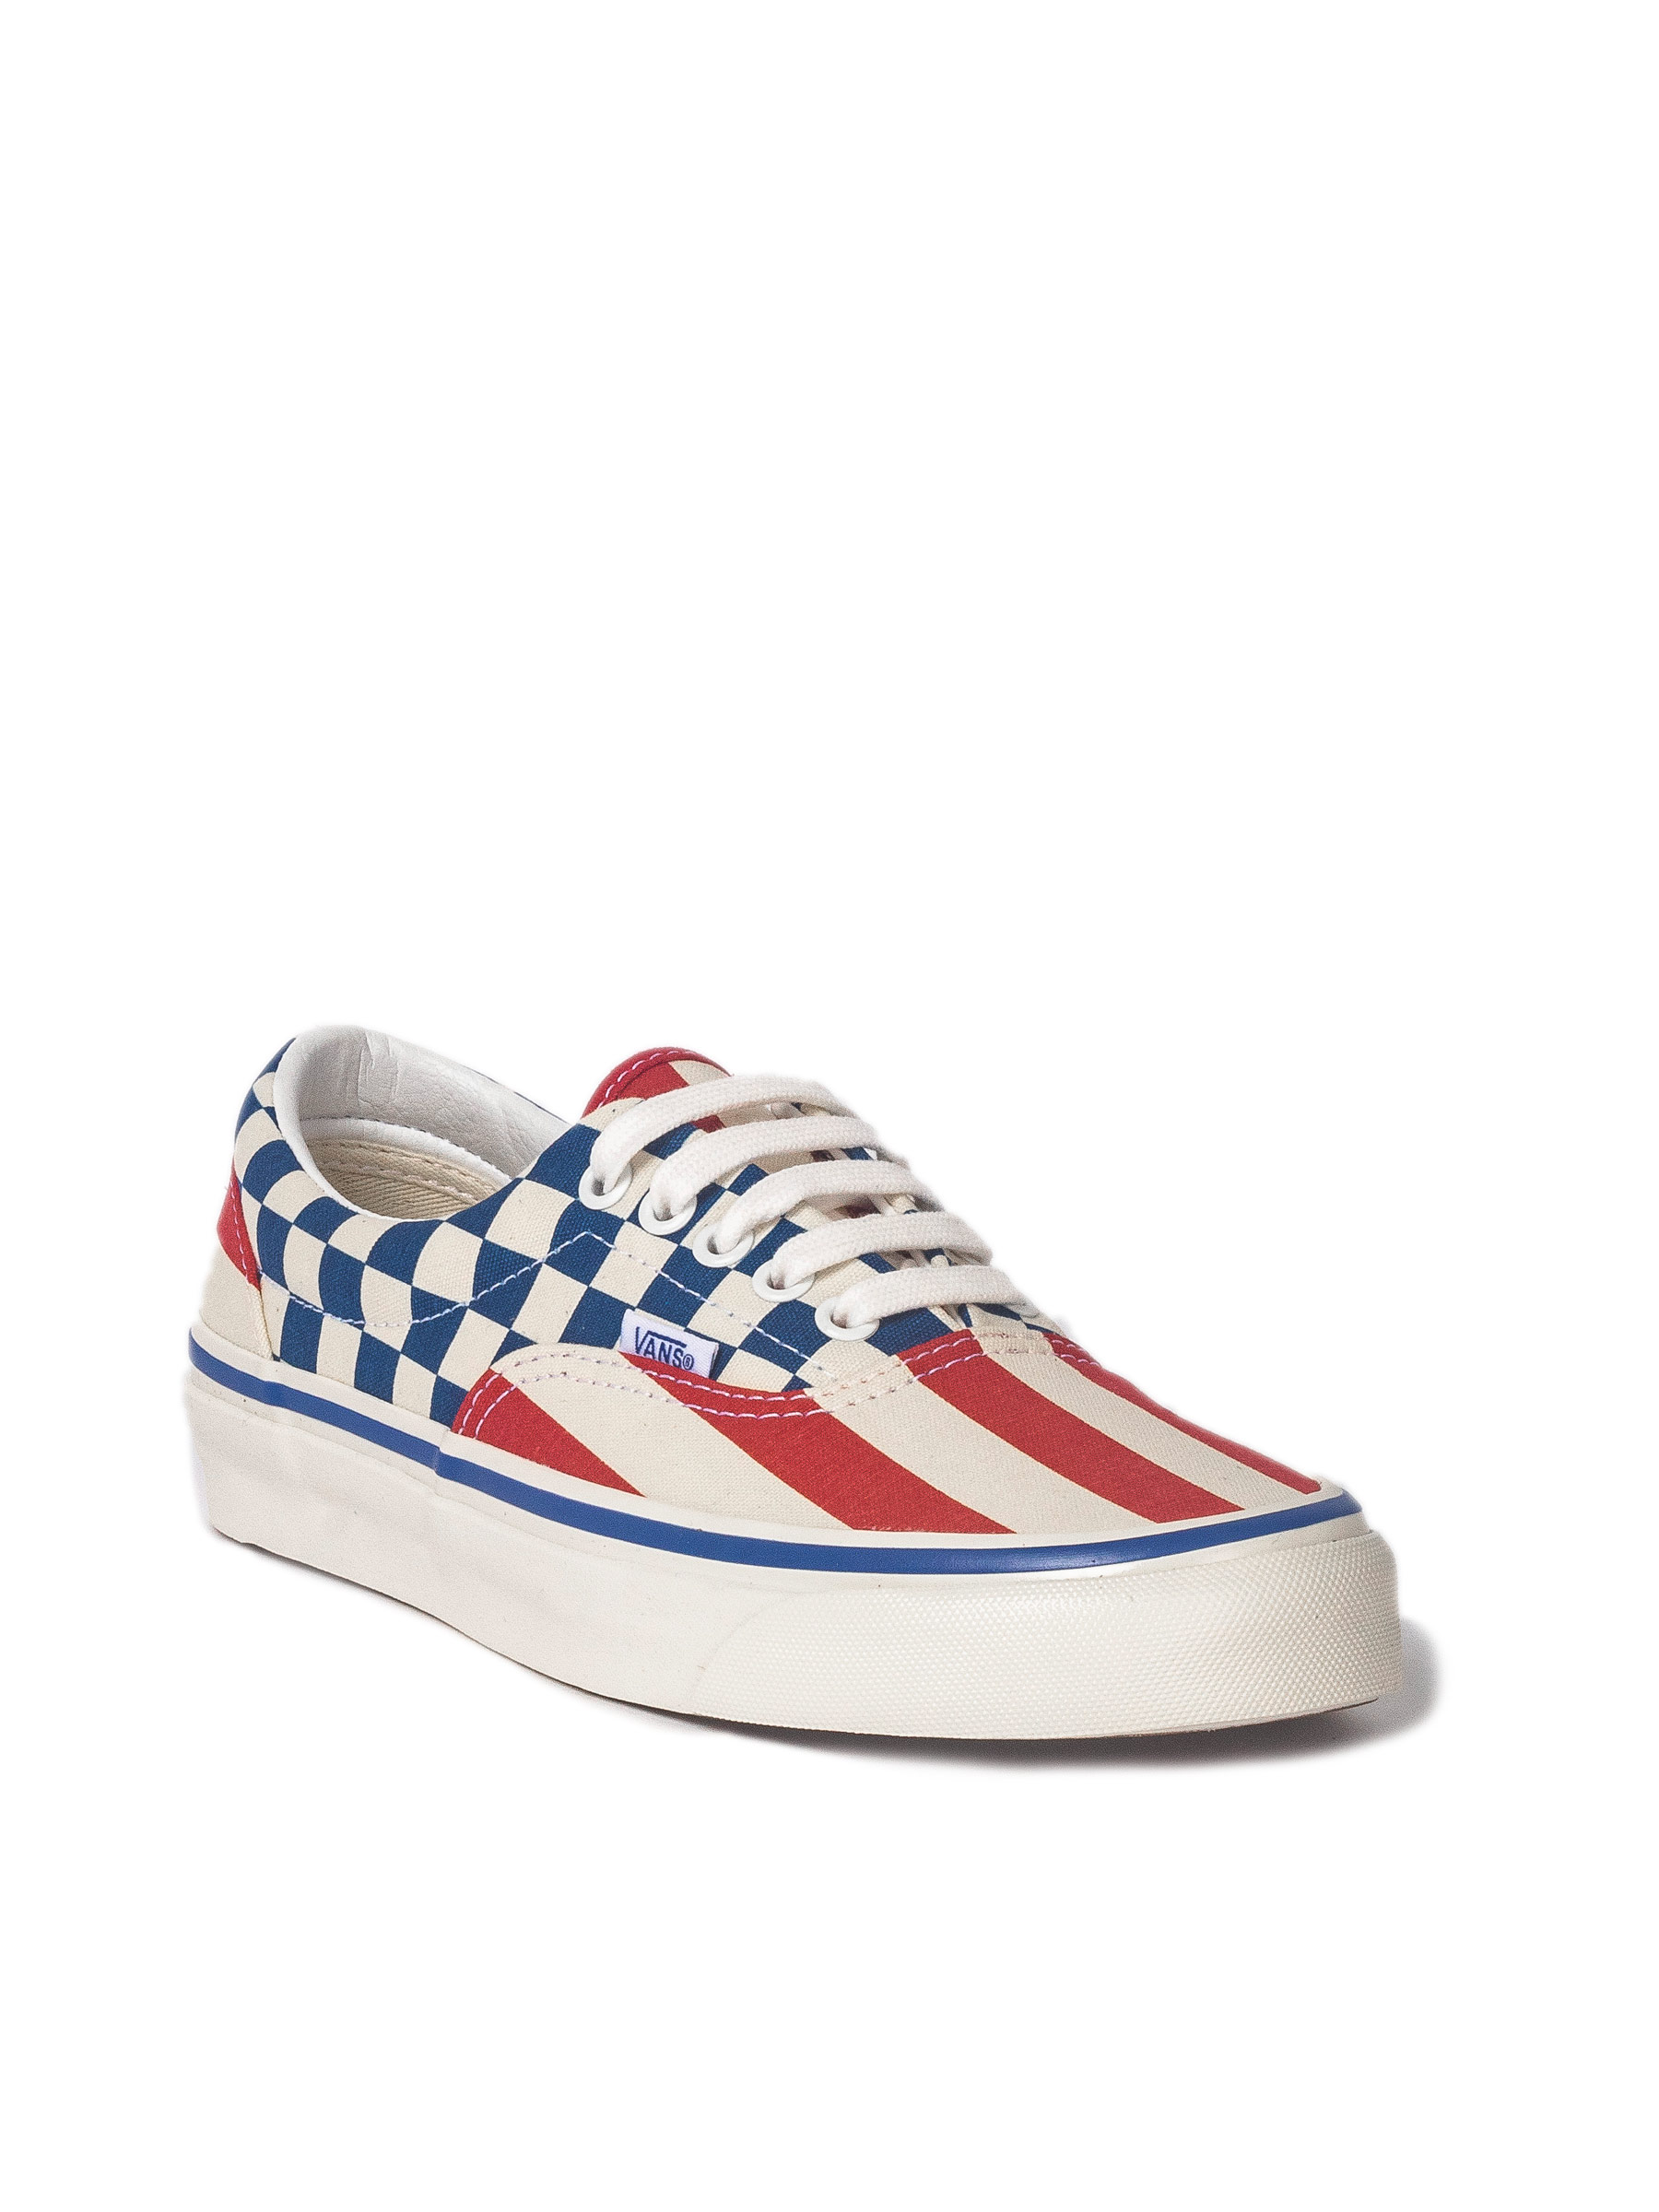 Vans era 95 dx VANS | Sneakers | VN0A2RR1VJC1ROSSO/BLU